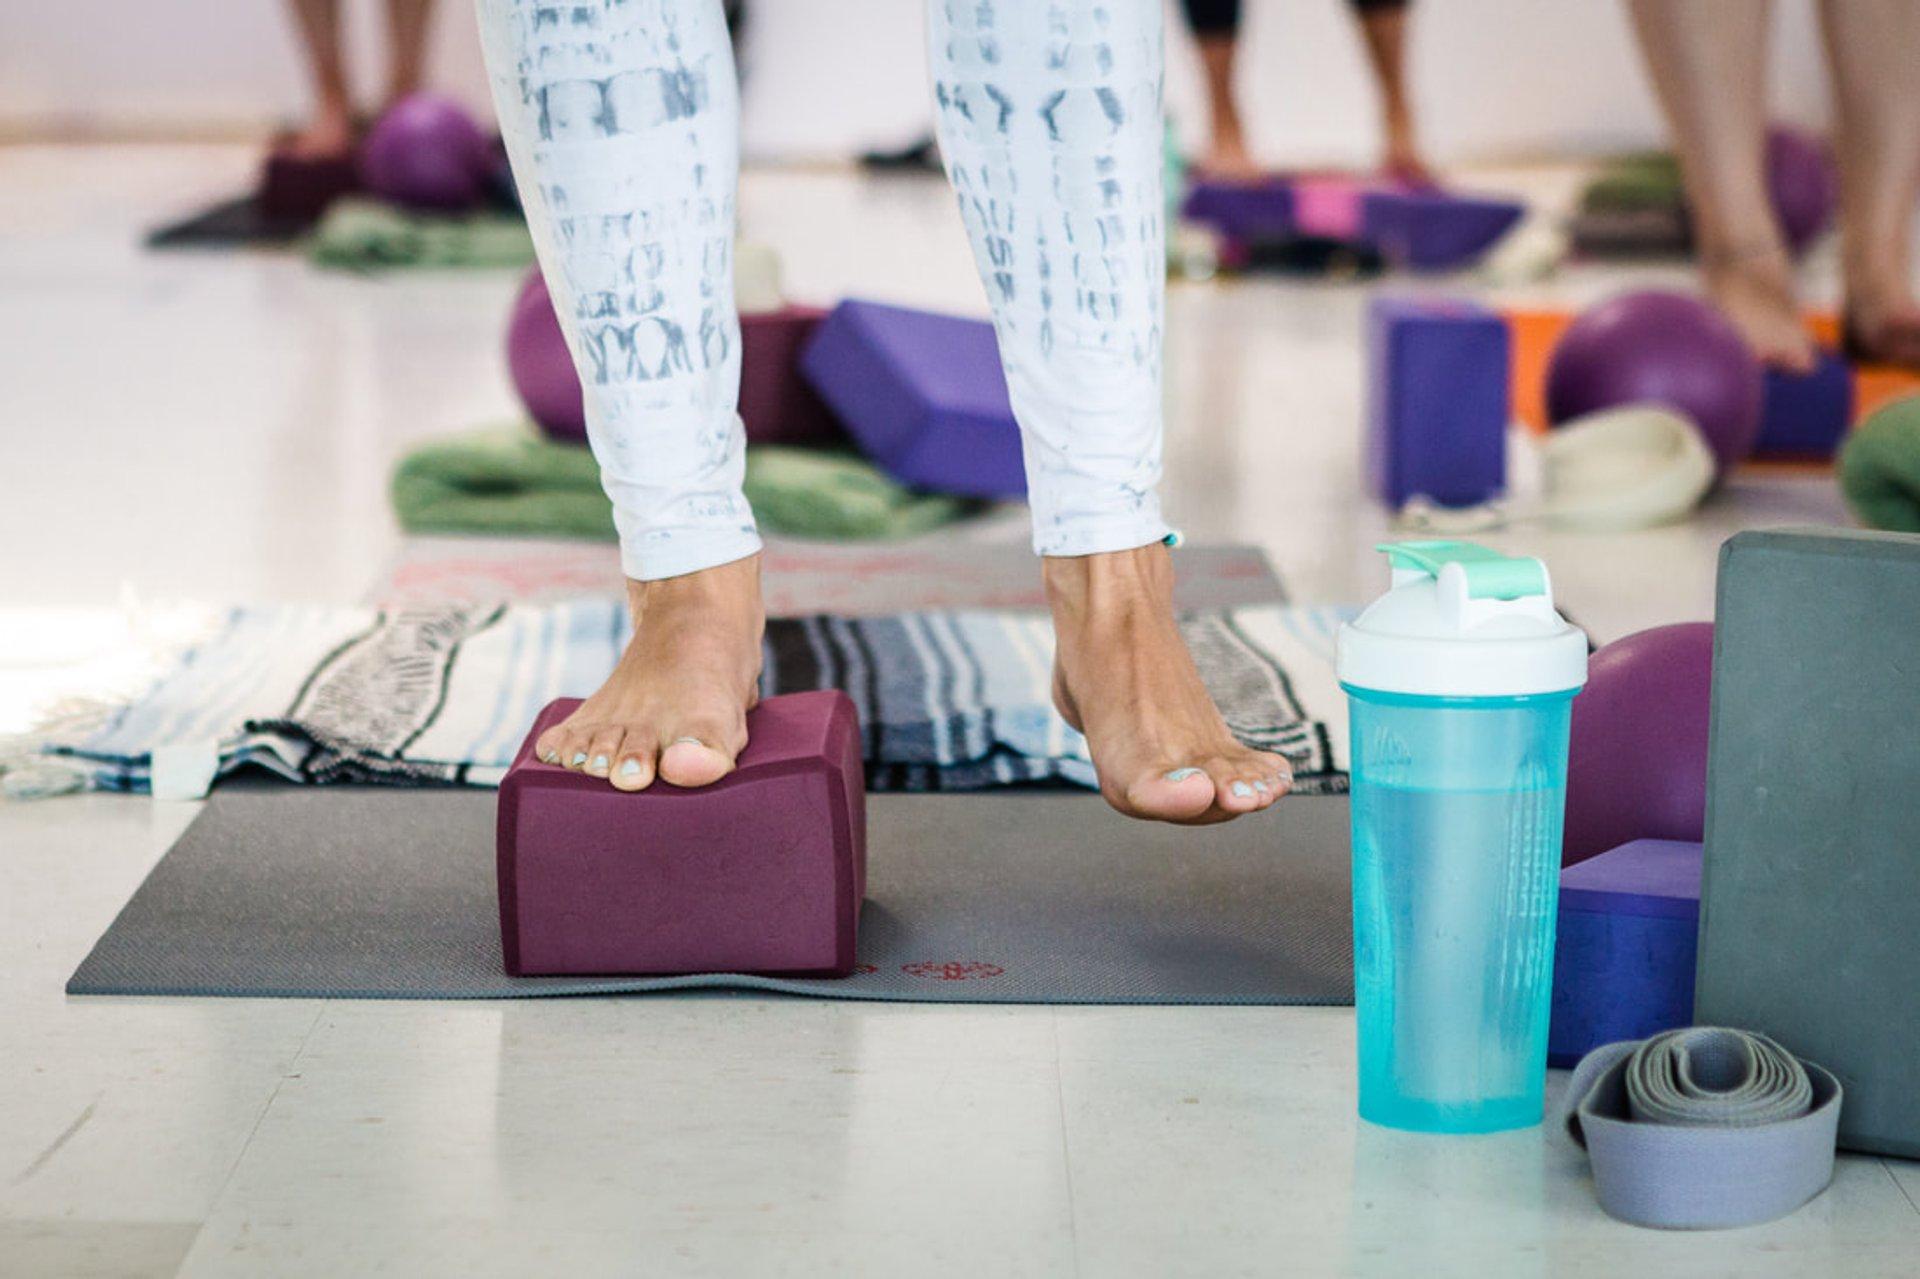 Maine YogaFest in Maine - Best Season 2020